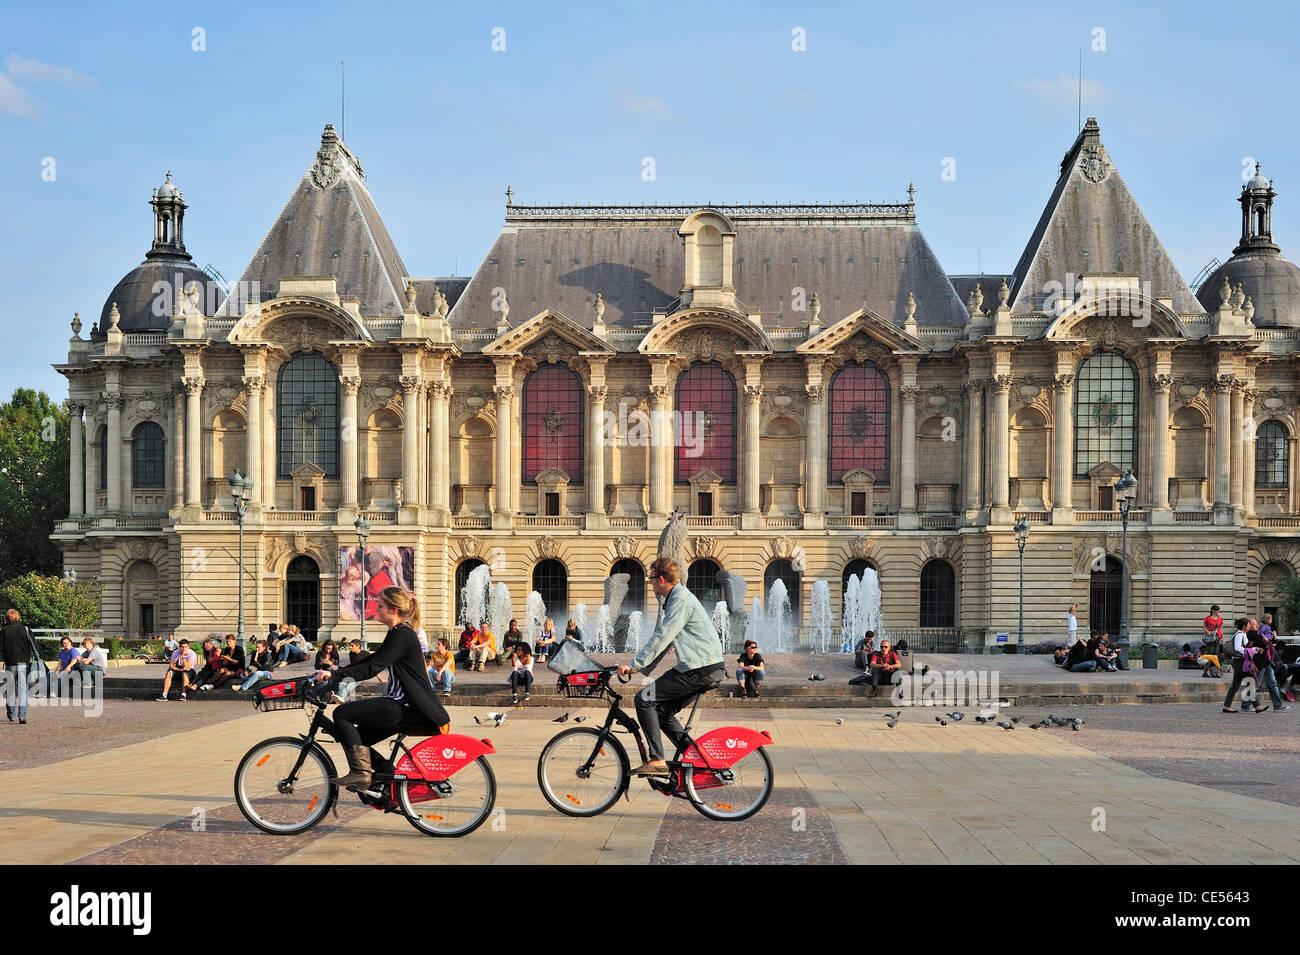 The Palais des Beaux-Arts de Lille / Lille Palace of Fine Arts and tourists riding rental bikes of V'Lille, France Stock Photo